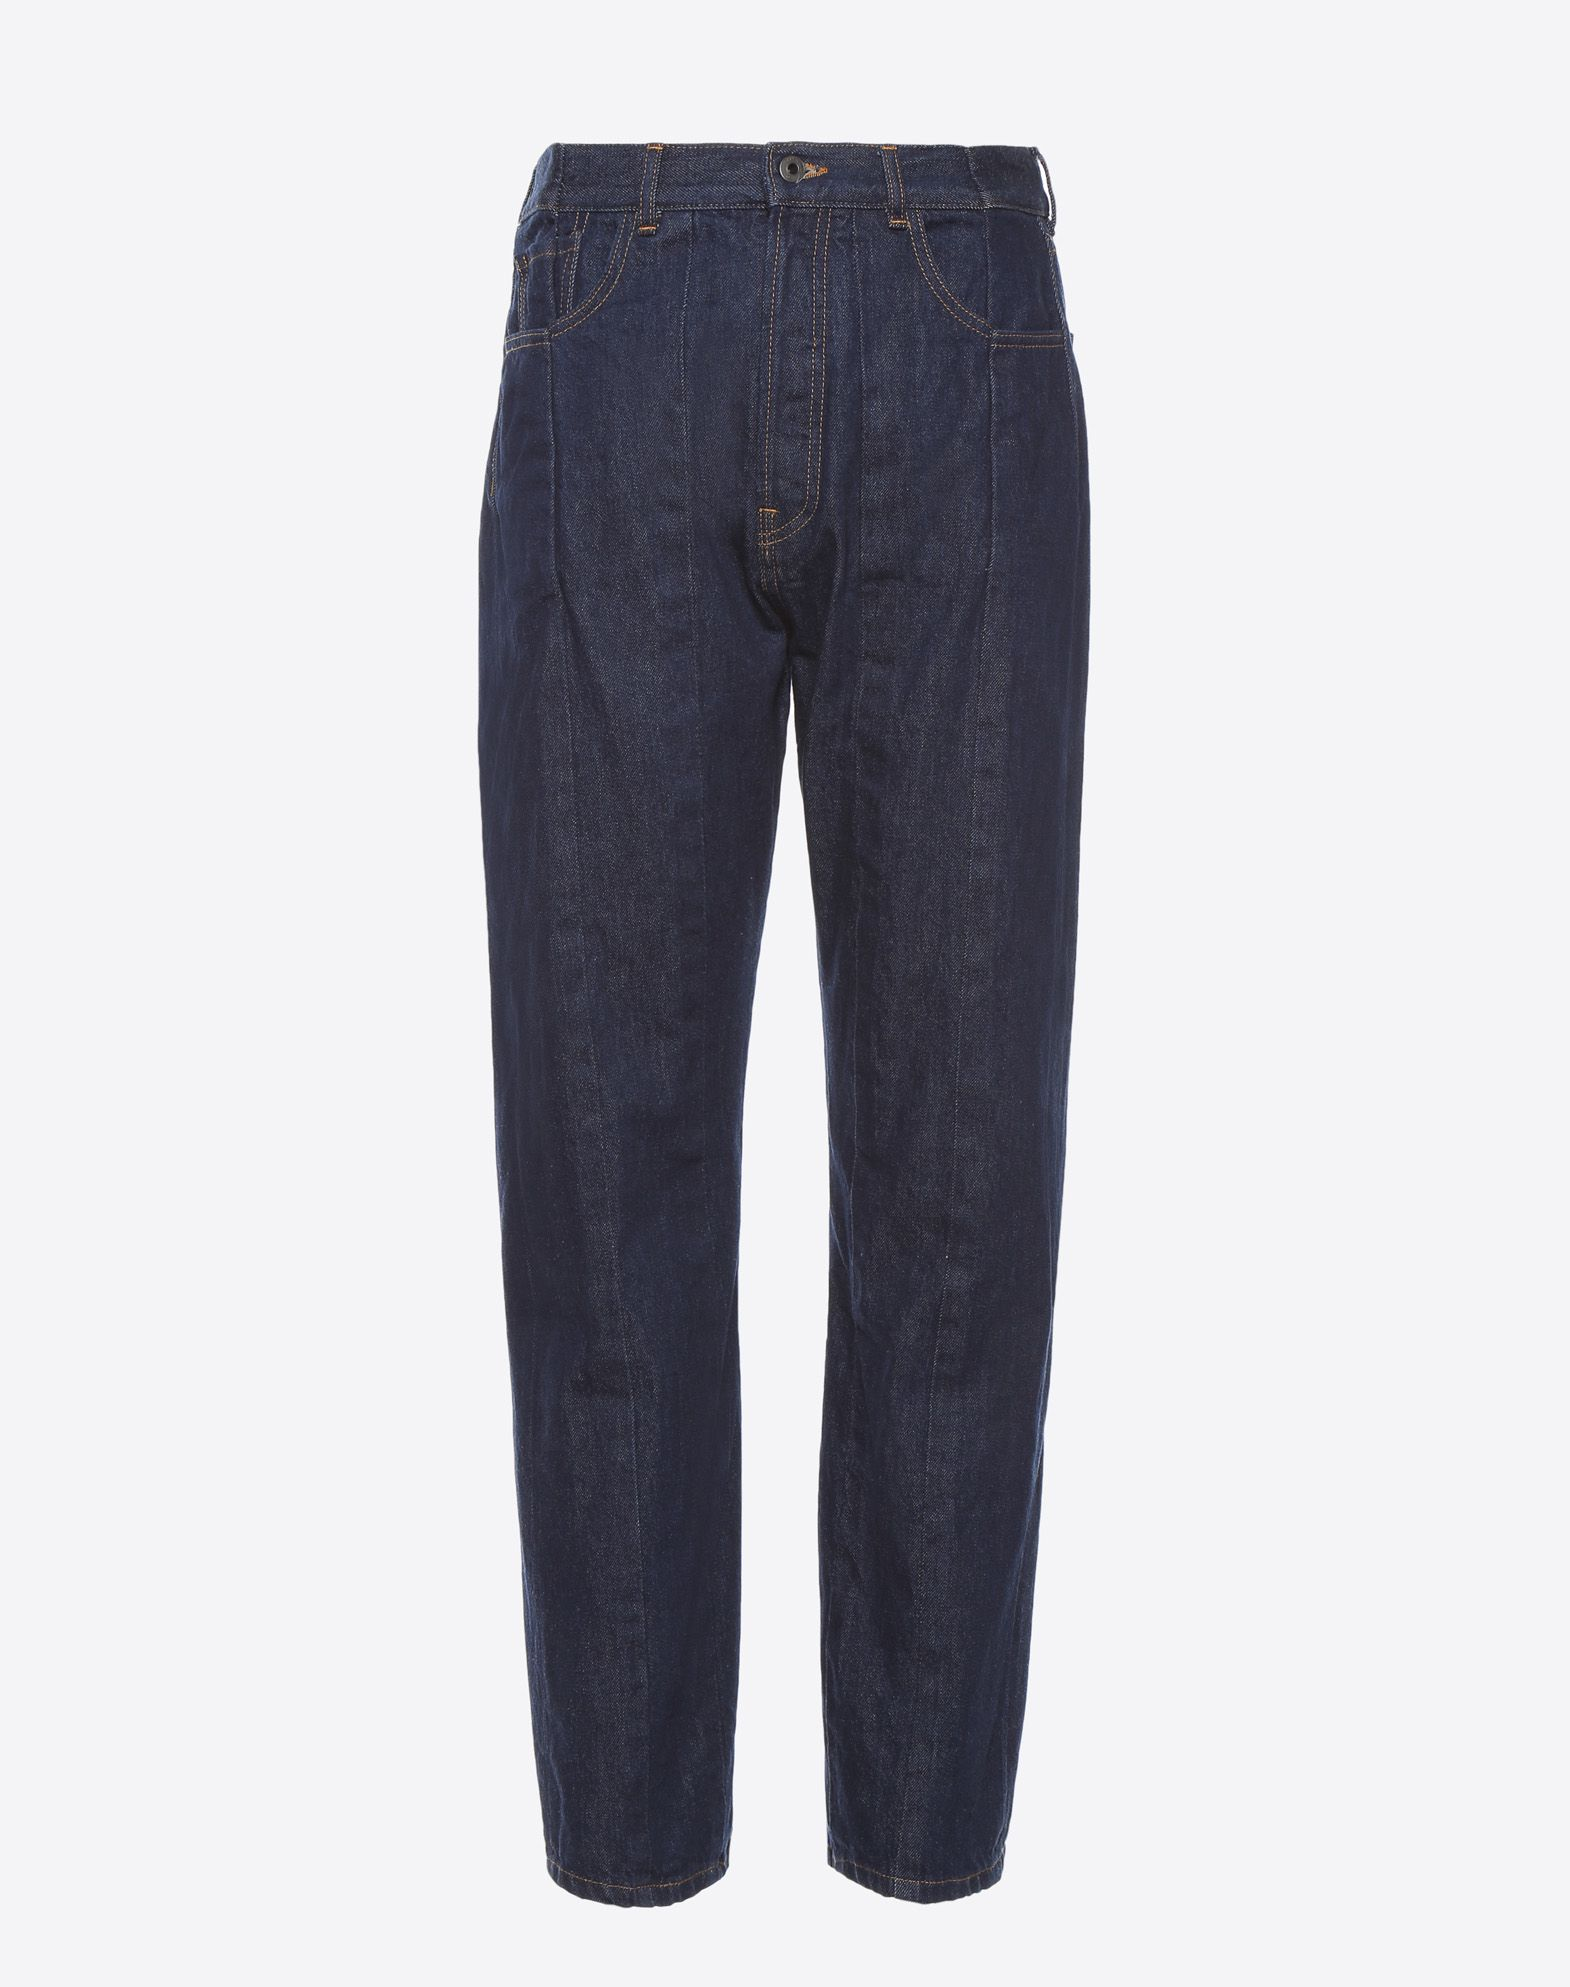 VALENTINO UOMO VLTN 5-pocket jeans DENIM U f